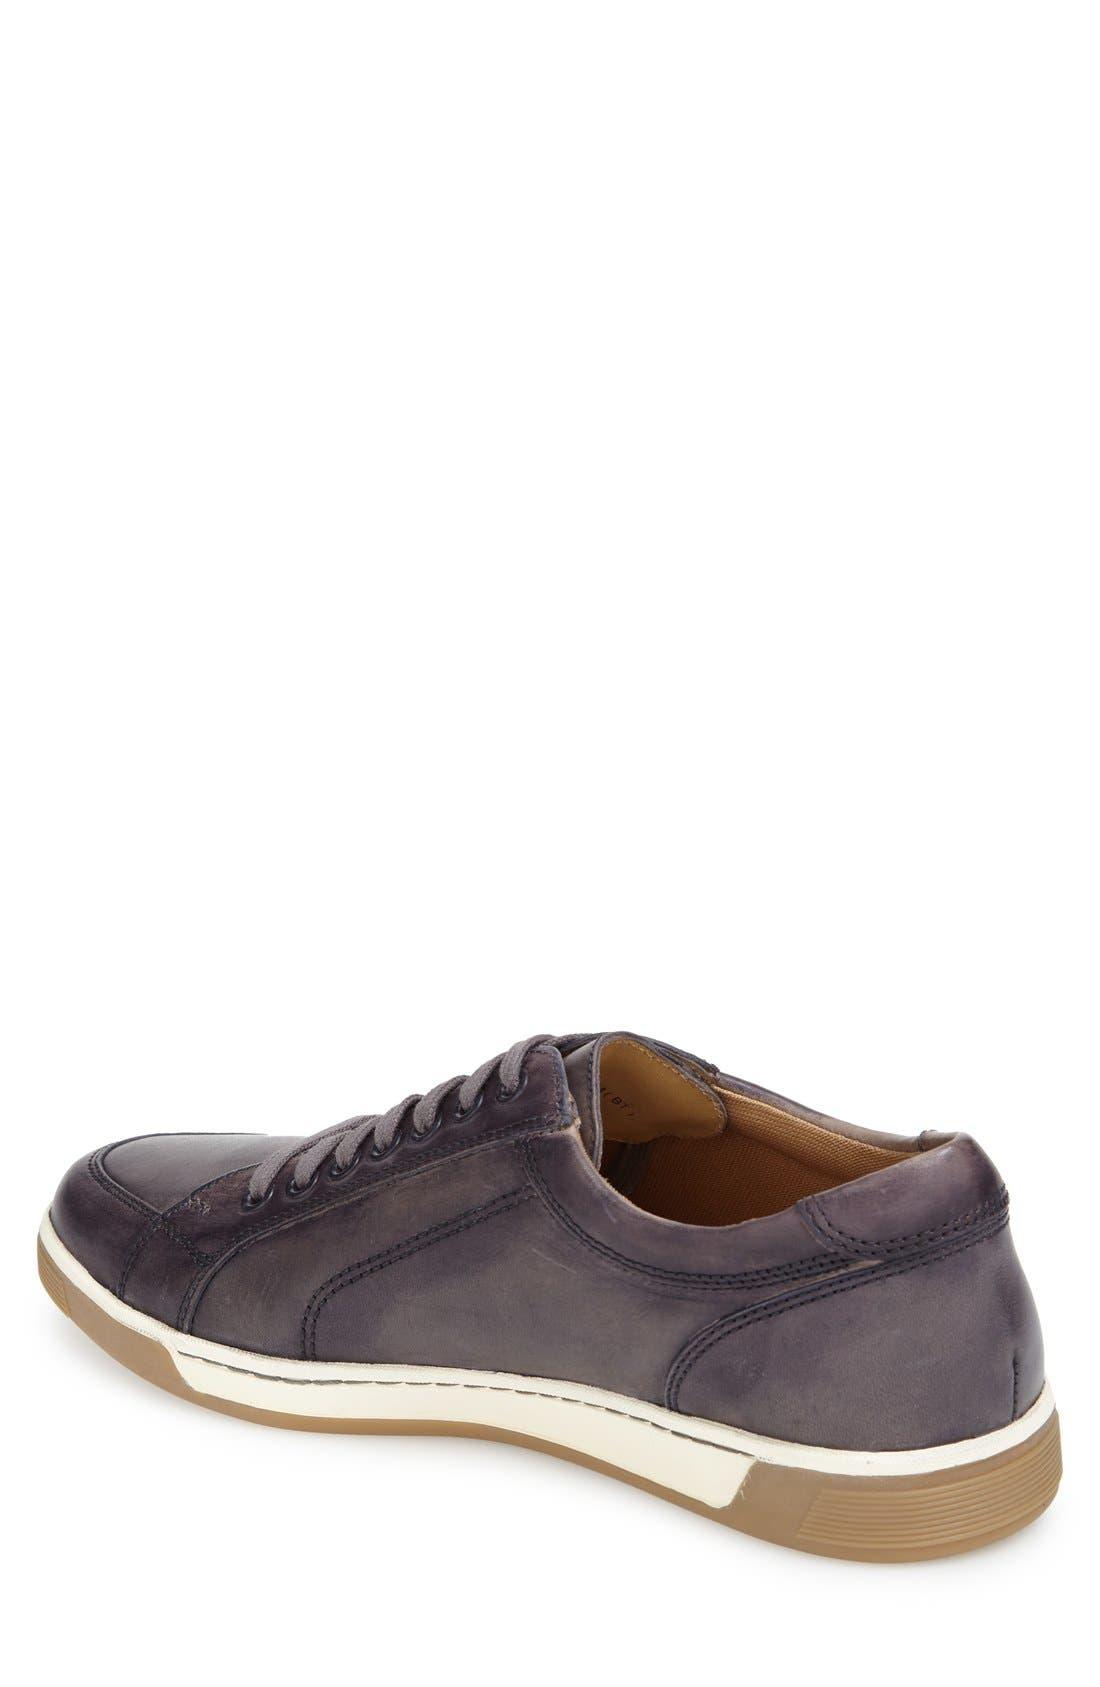 'Vartan Sport Oxford' Sneaker,                             Alternate thumbnail 23, color,